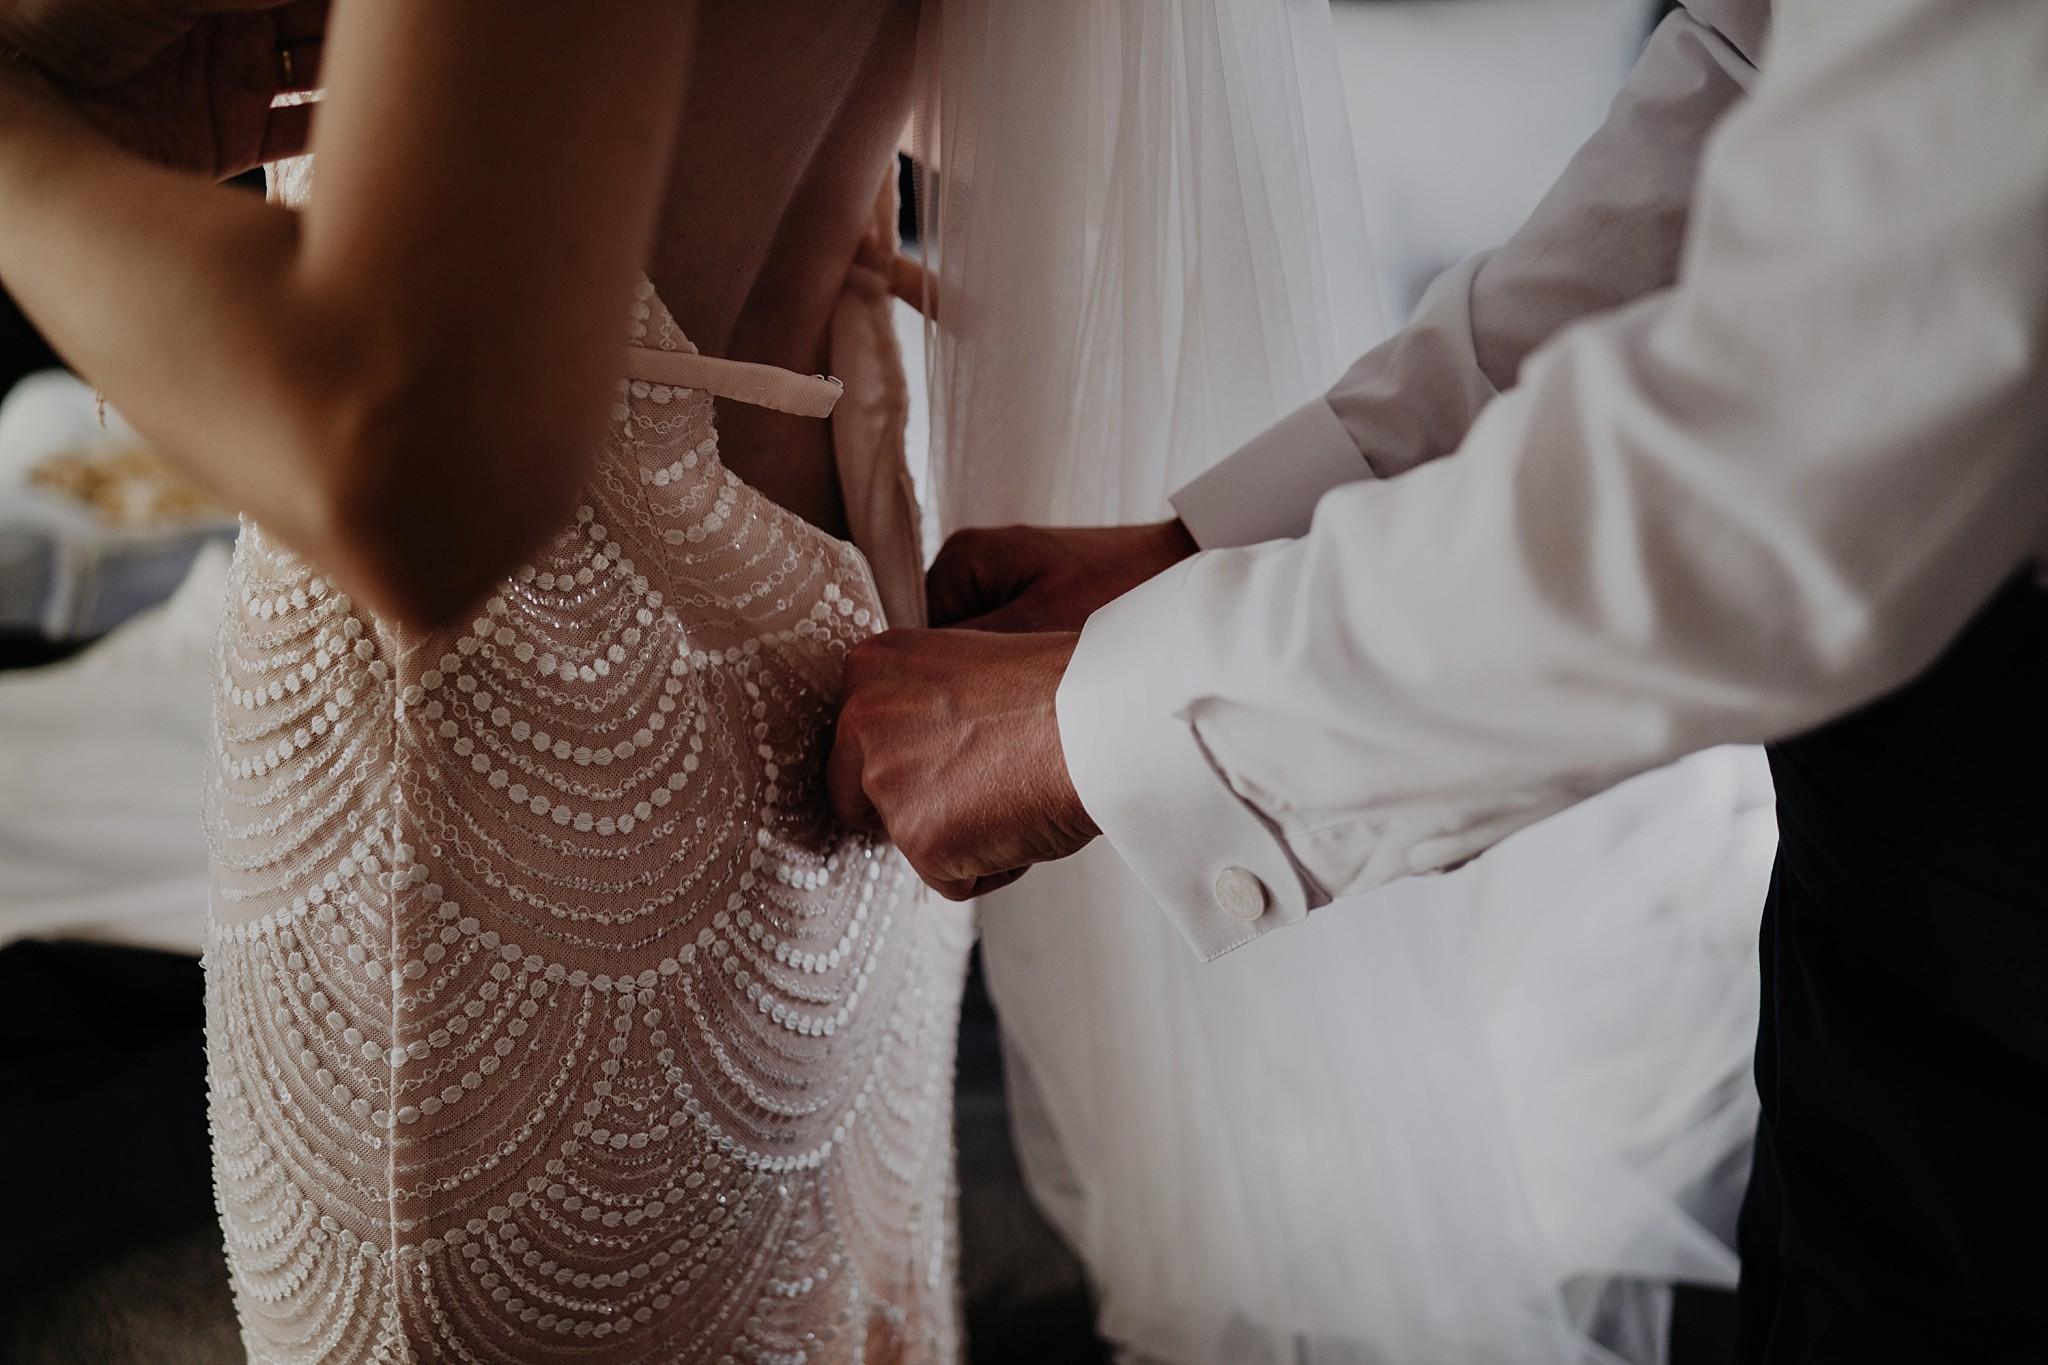 fotograf poznan wesele dobra truskawka piekne wesele pod poznaniem wesele w dobrej truskawce piekna para mloda slub marzen slub koronawirus slub listopad wesele koronawirus 073